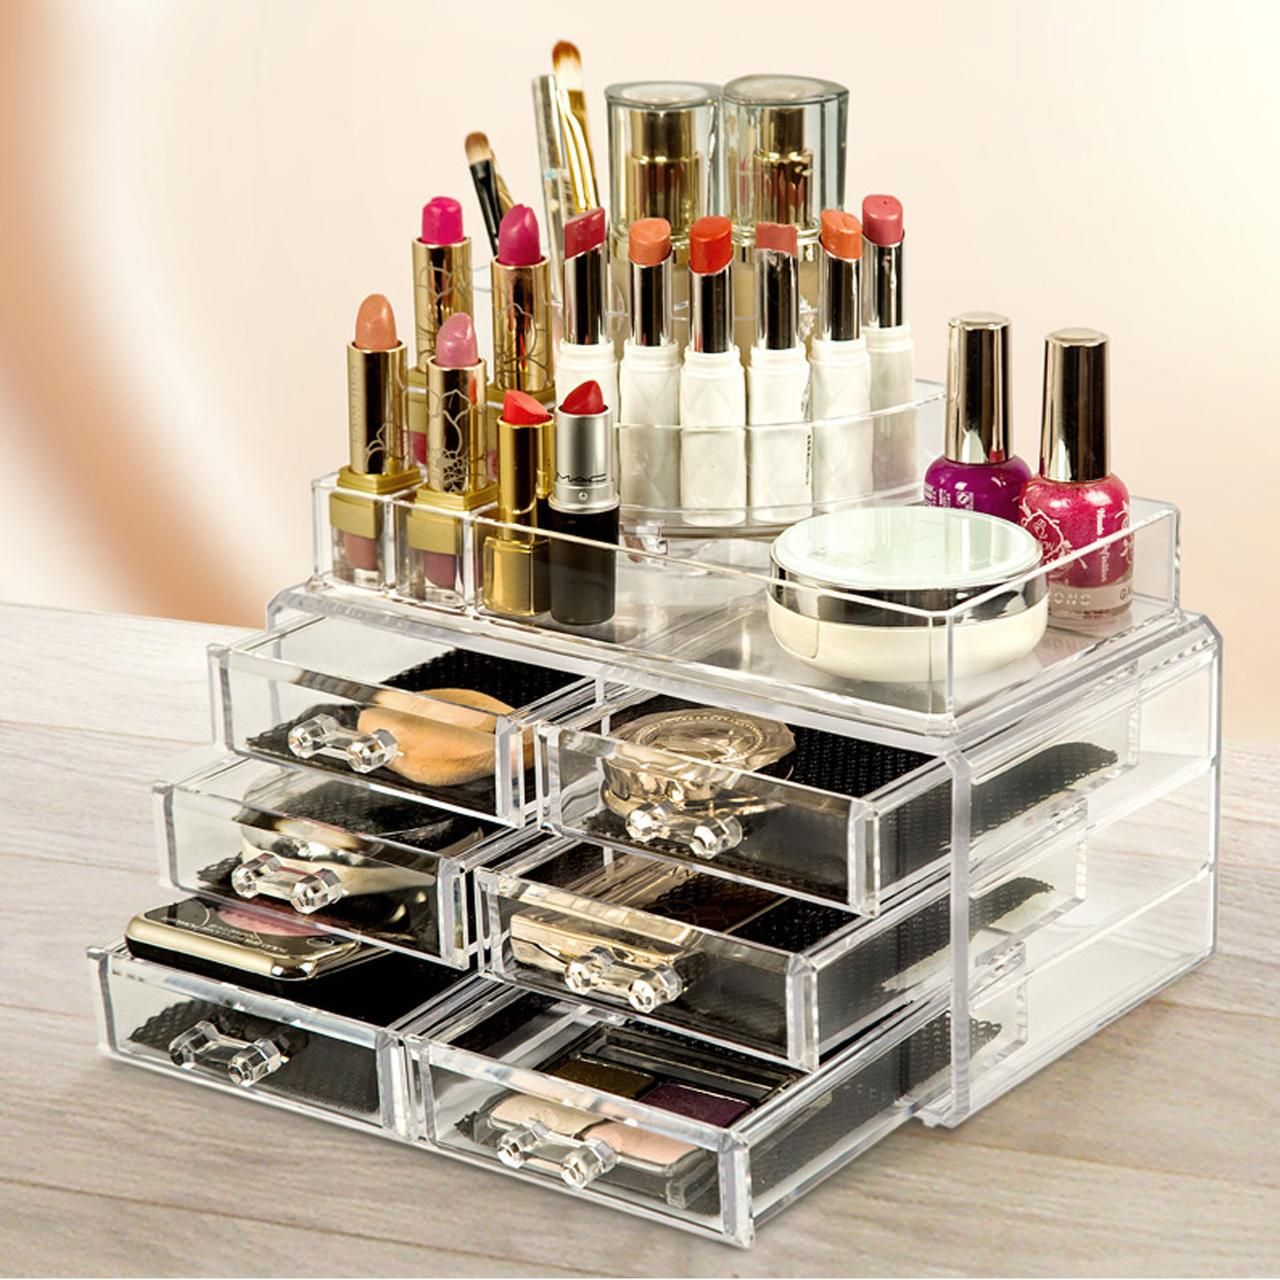 Акриловый органайзер для косметики Cosmetic Box 6 Drawer GW-812, 6 ящиков для косметики